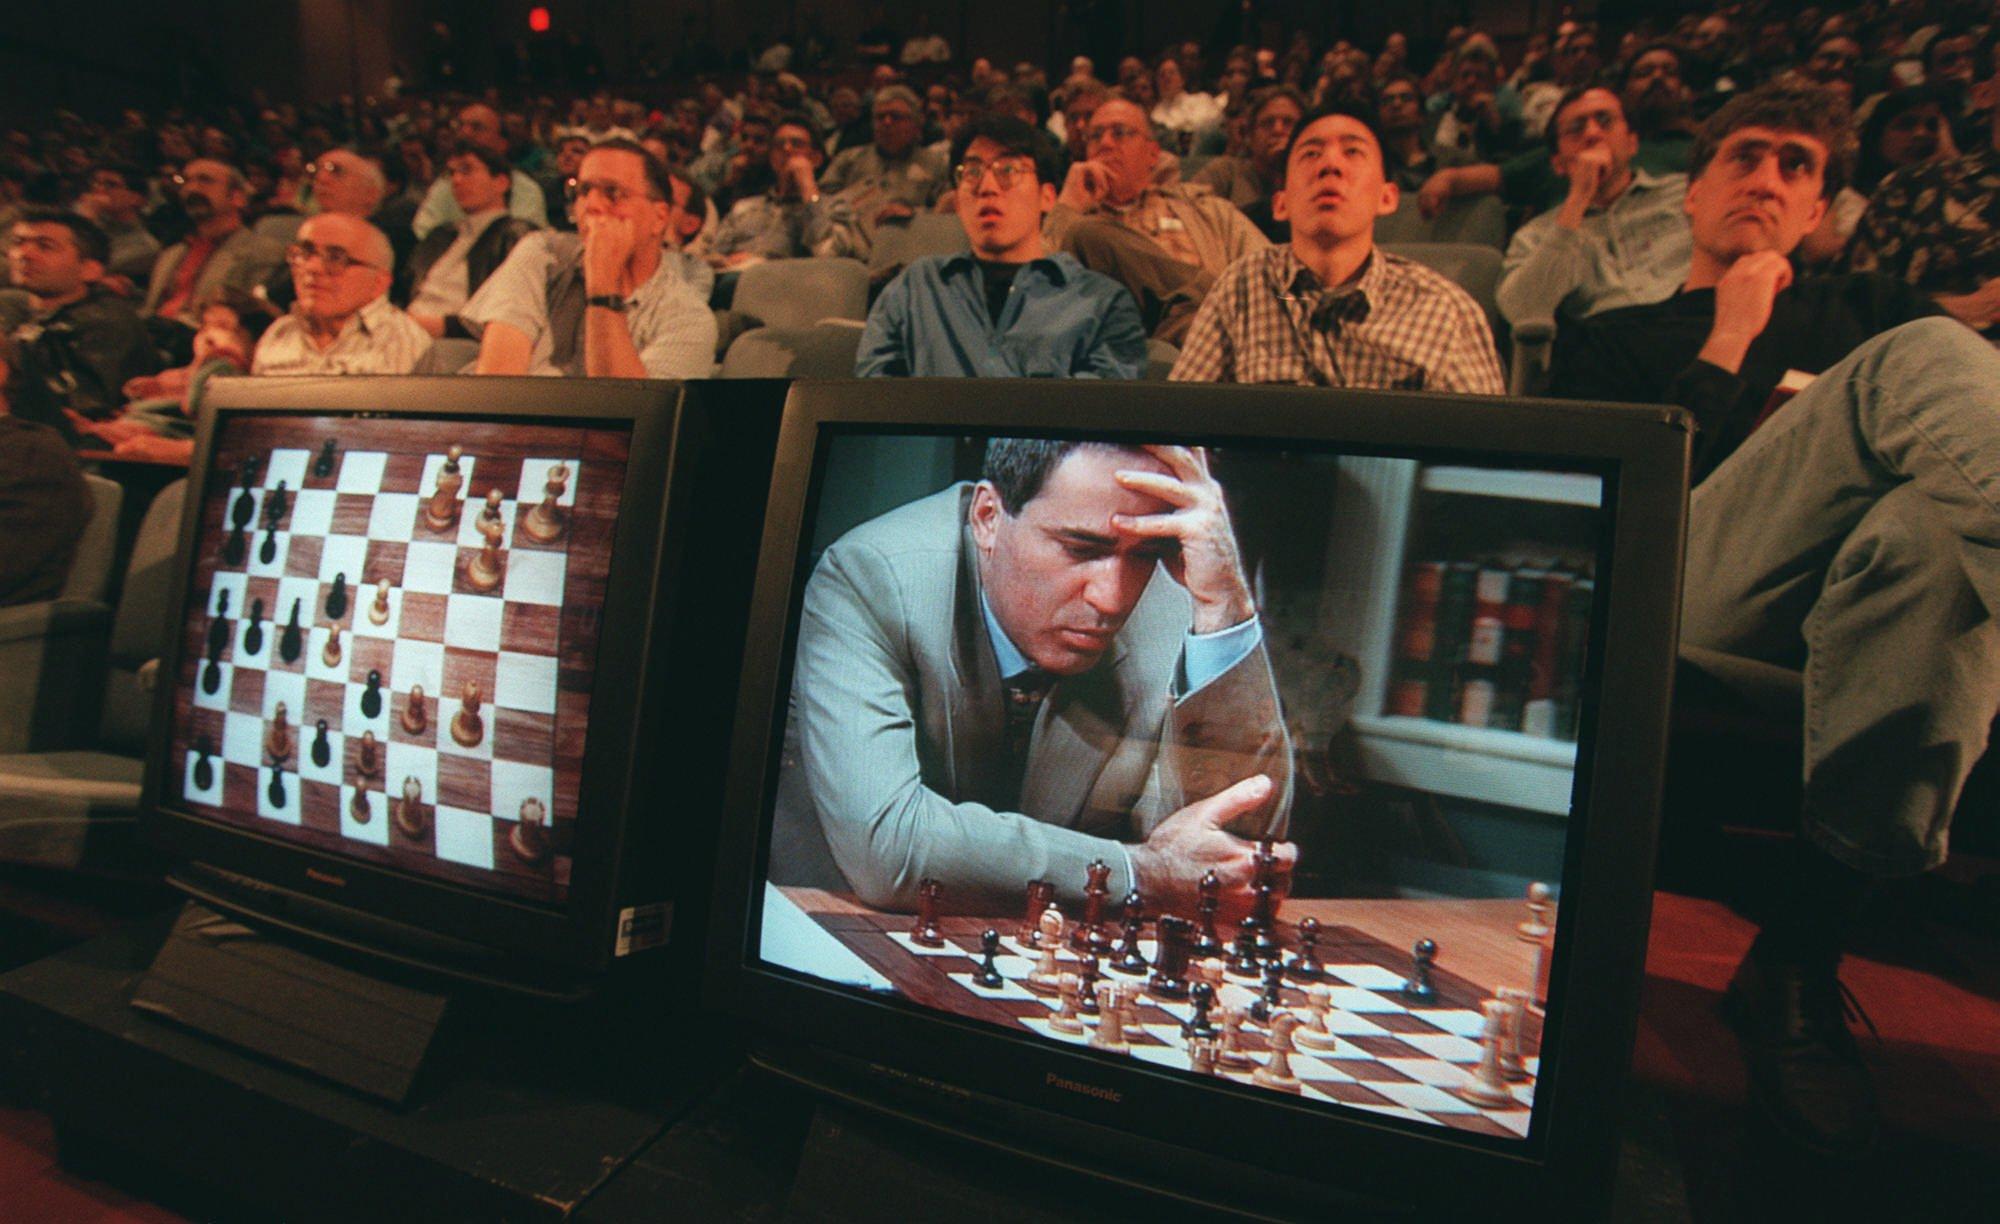 Gary Kasparov vs. IBM's Deep Blue: Historic chess match before 'Queen's Gambit' chess boom - The Washington Post